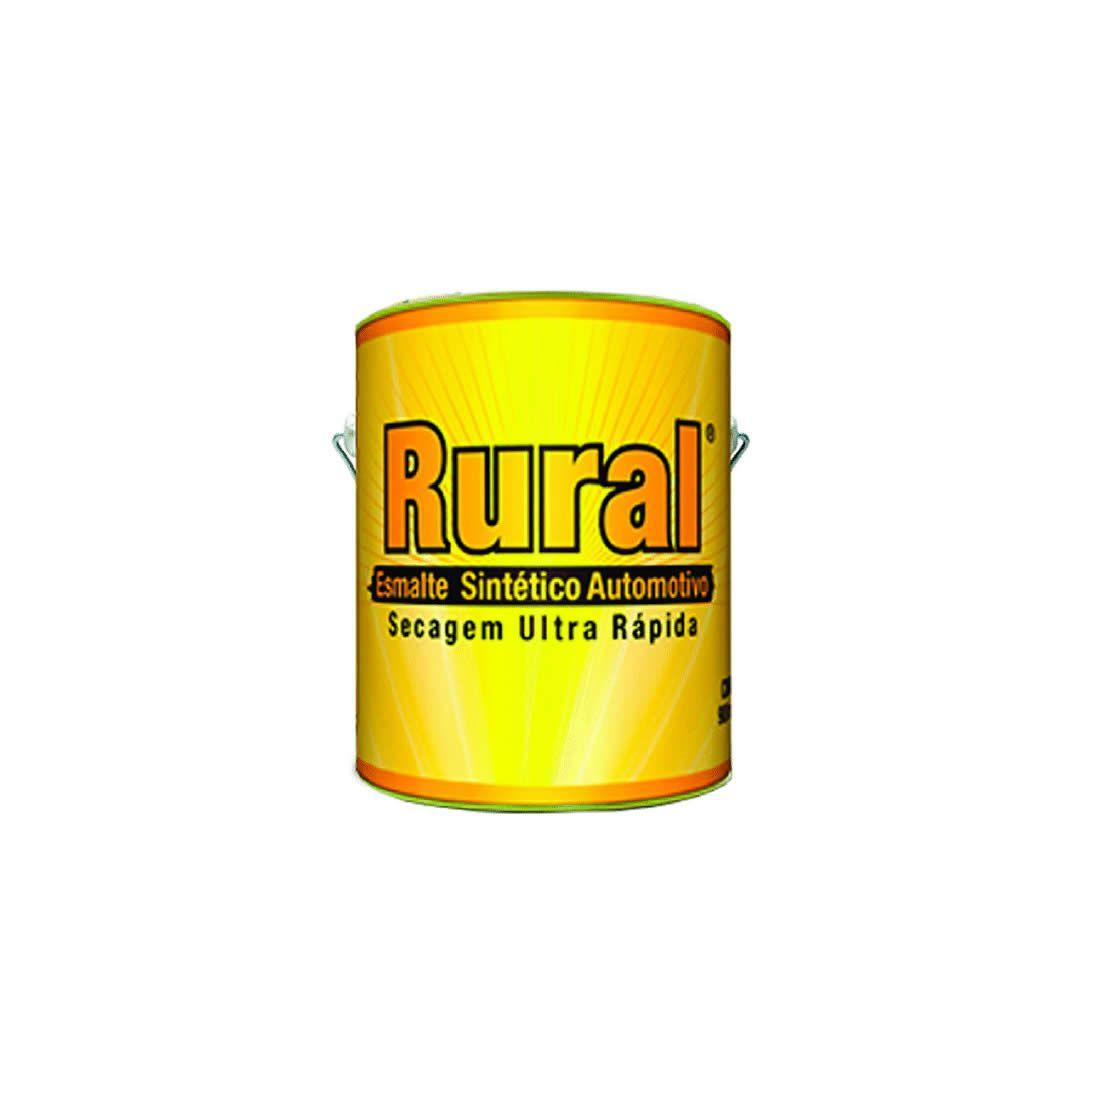 Esmalte Sintético Rural Secagem Ultra Rápido Amarelo Caterpillar 6102 3,6Lt